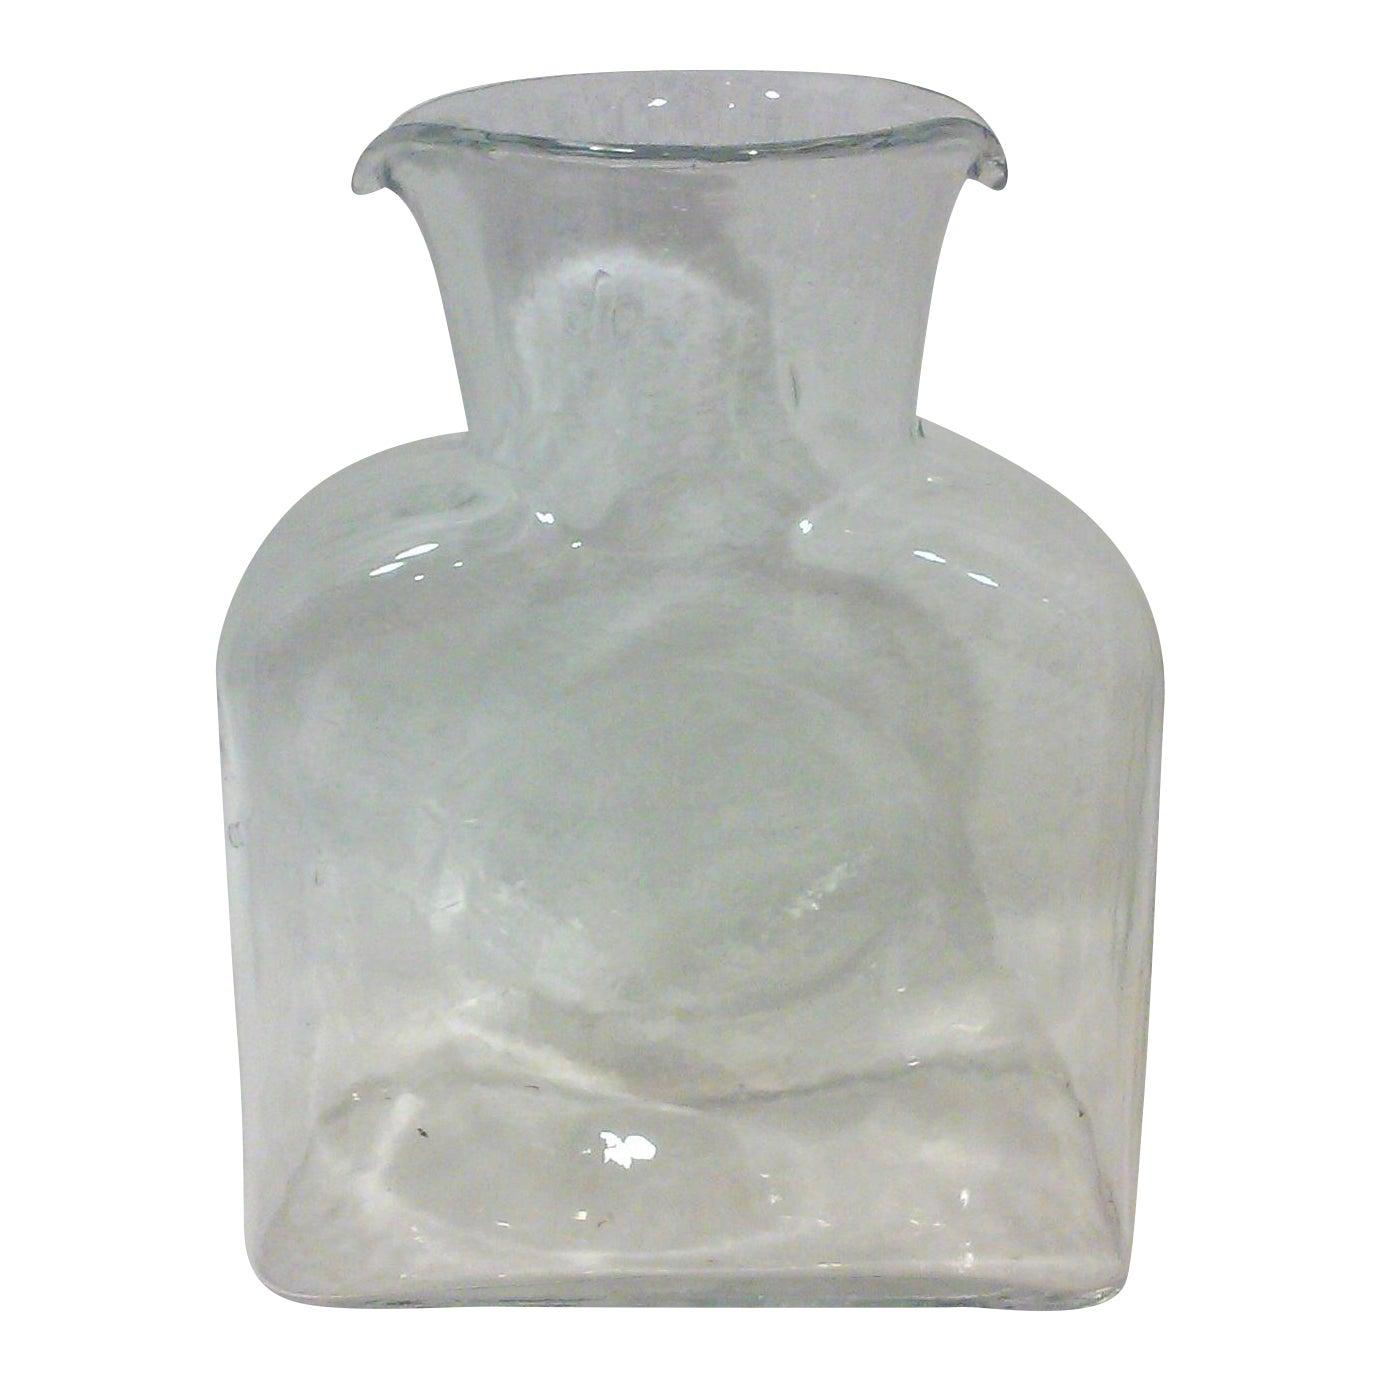 Blenko clear glass water pitcher chairish